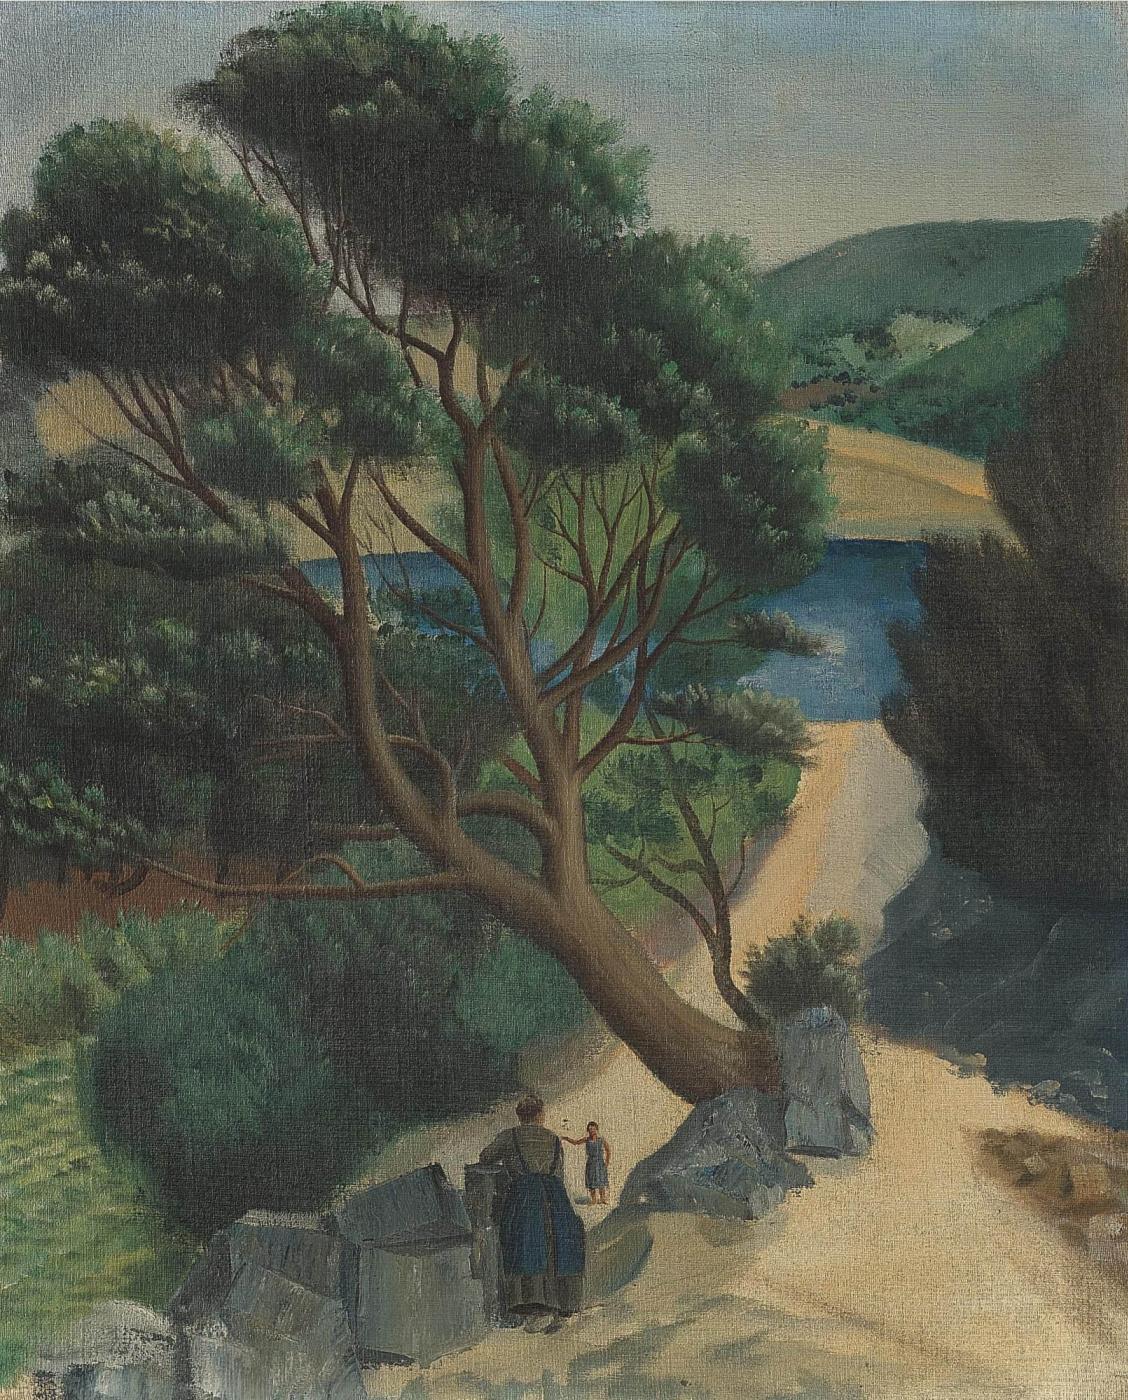 Vasily Ivanovich Shukhaev. Landscape in Cassis. 1928